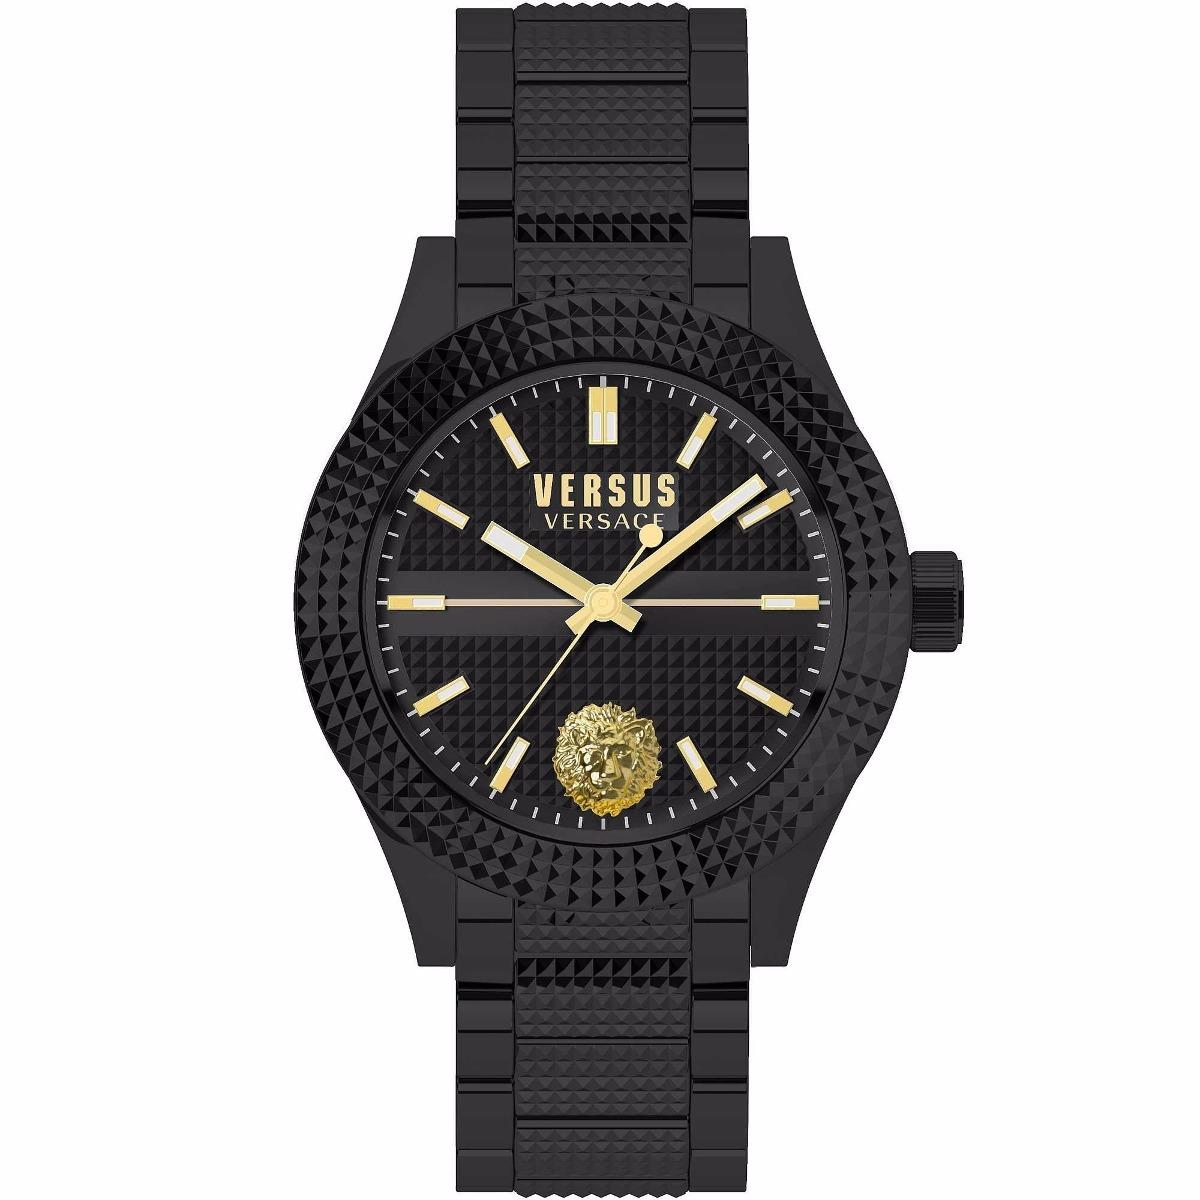 597bbb19e5ae reloj versus by versace bayside negro bayside15. Cargando zoom.